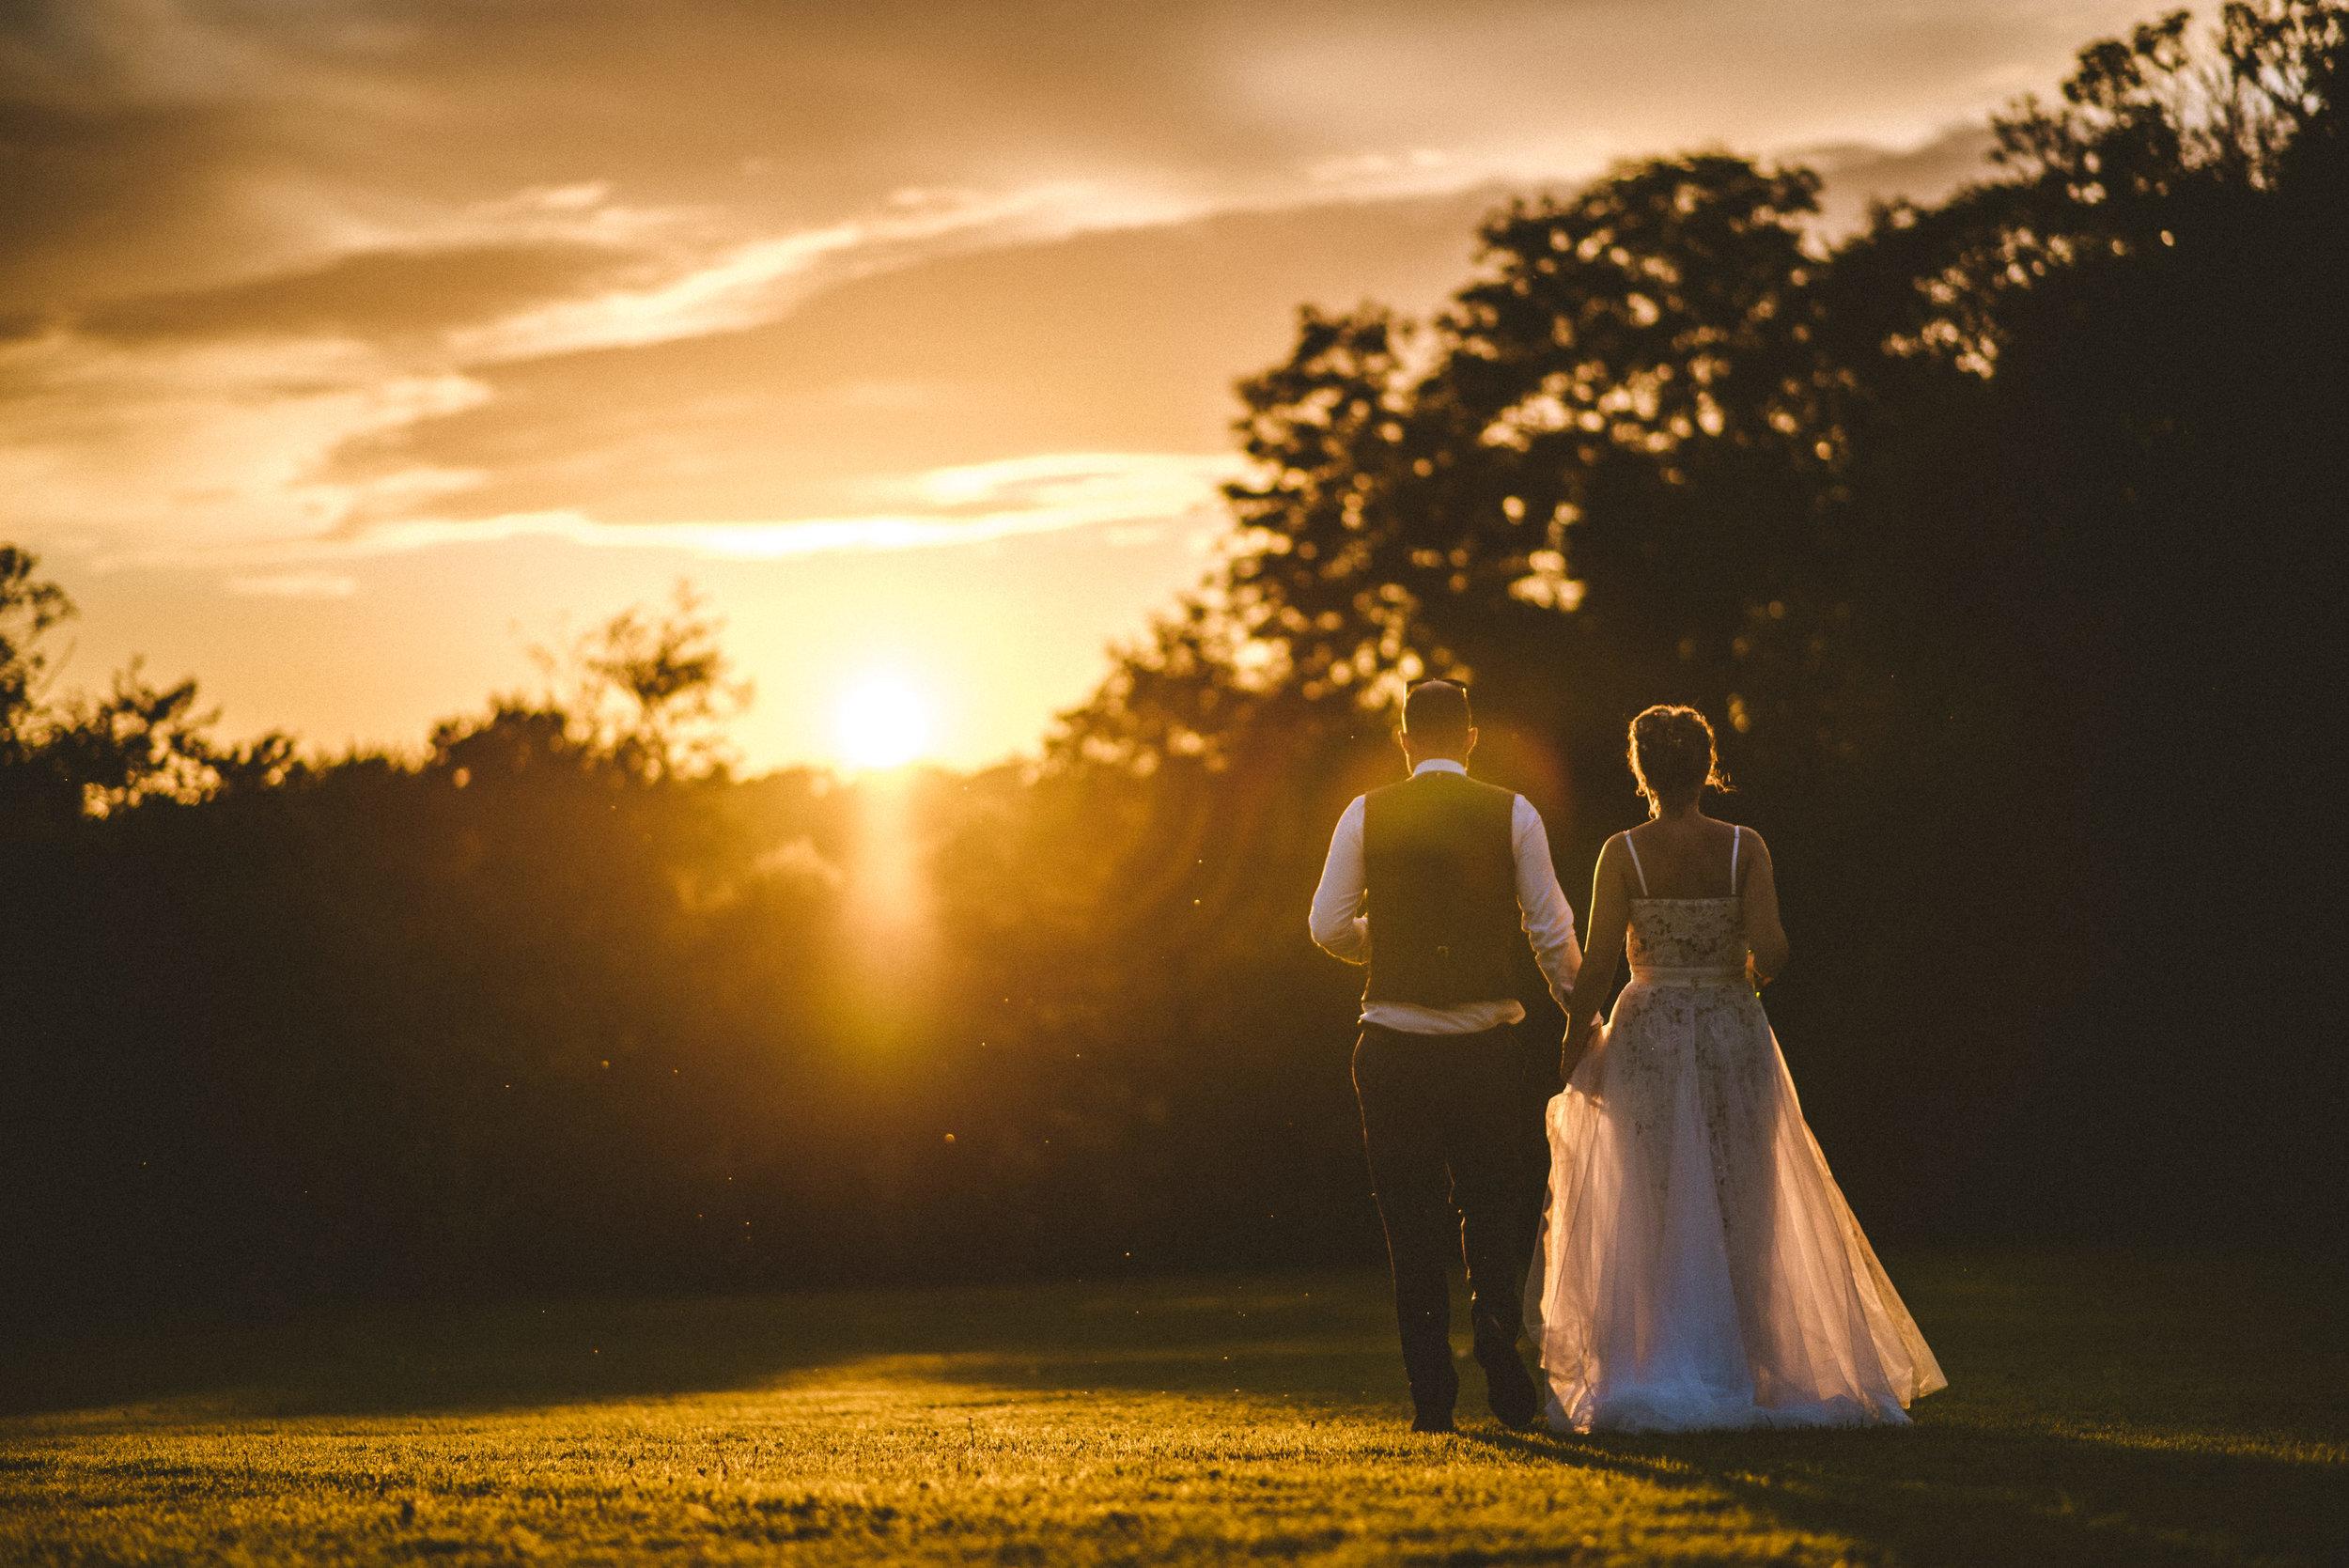 pencarrow-house-wedding-photographer-138.jpg